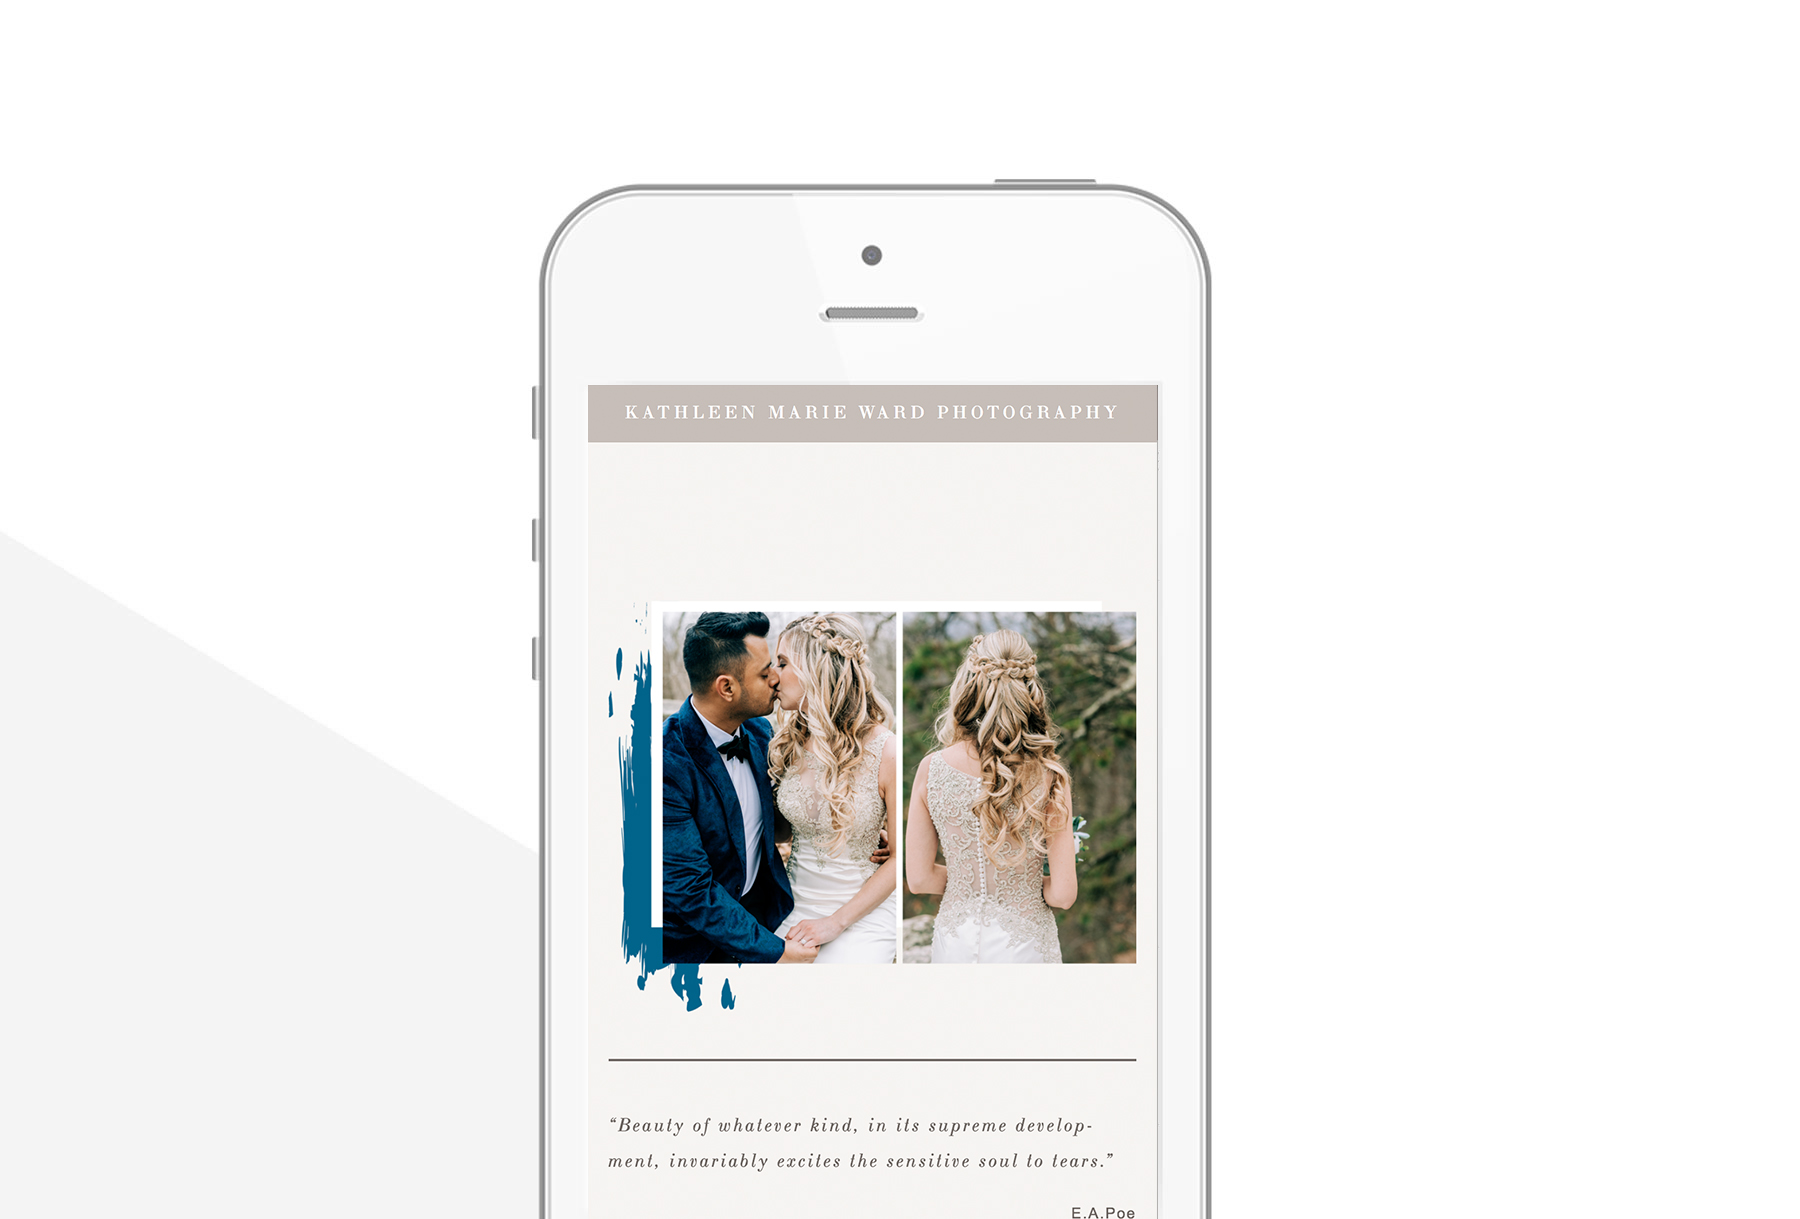 wedding-photographer-website-designs-2.jpg